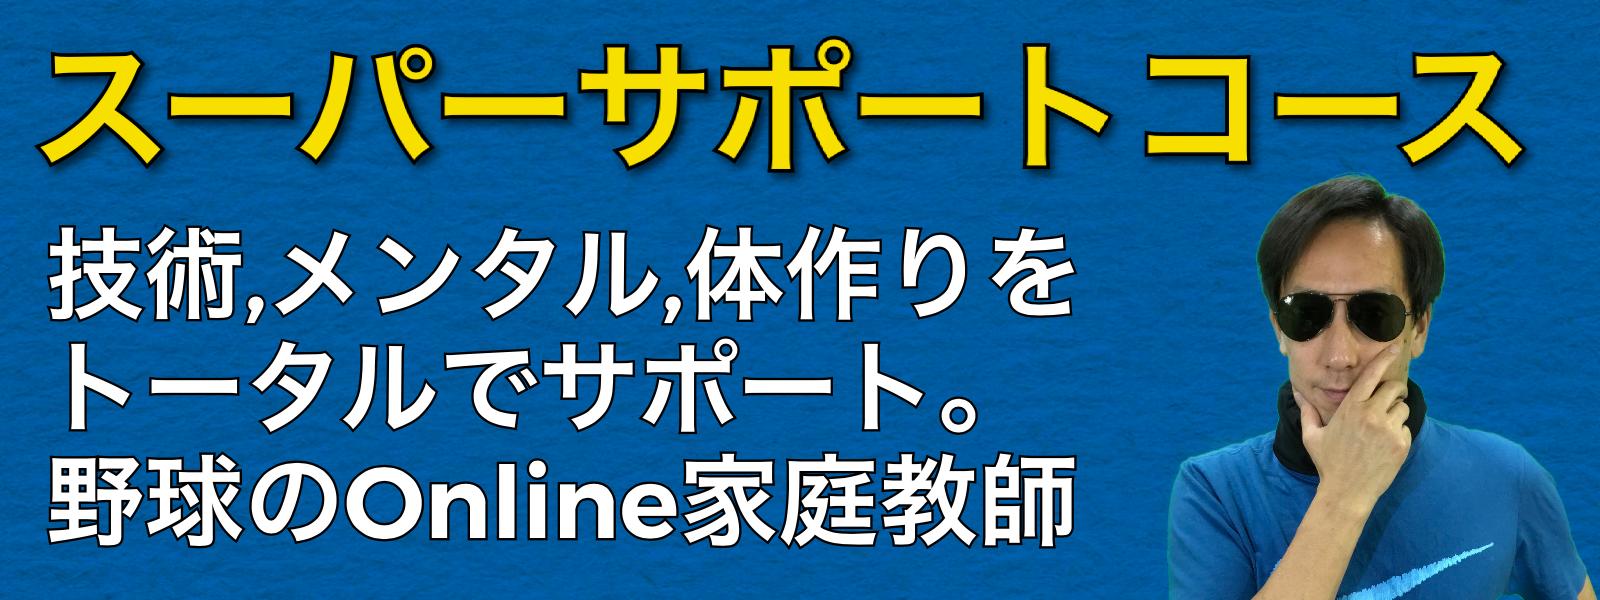 TeamKazオンライン野球塾スーパーサポートコース